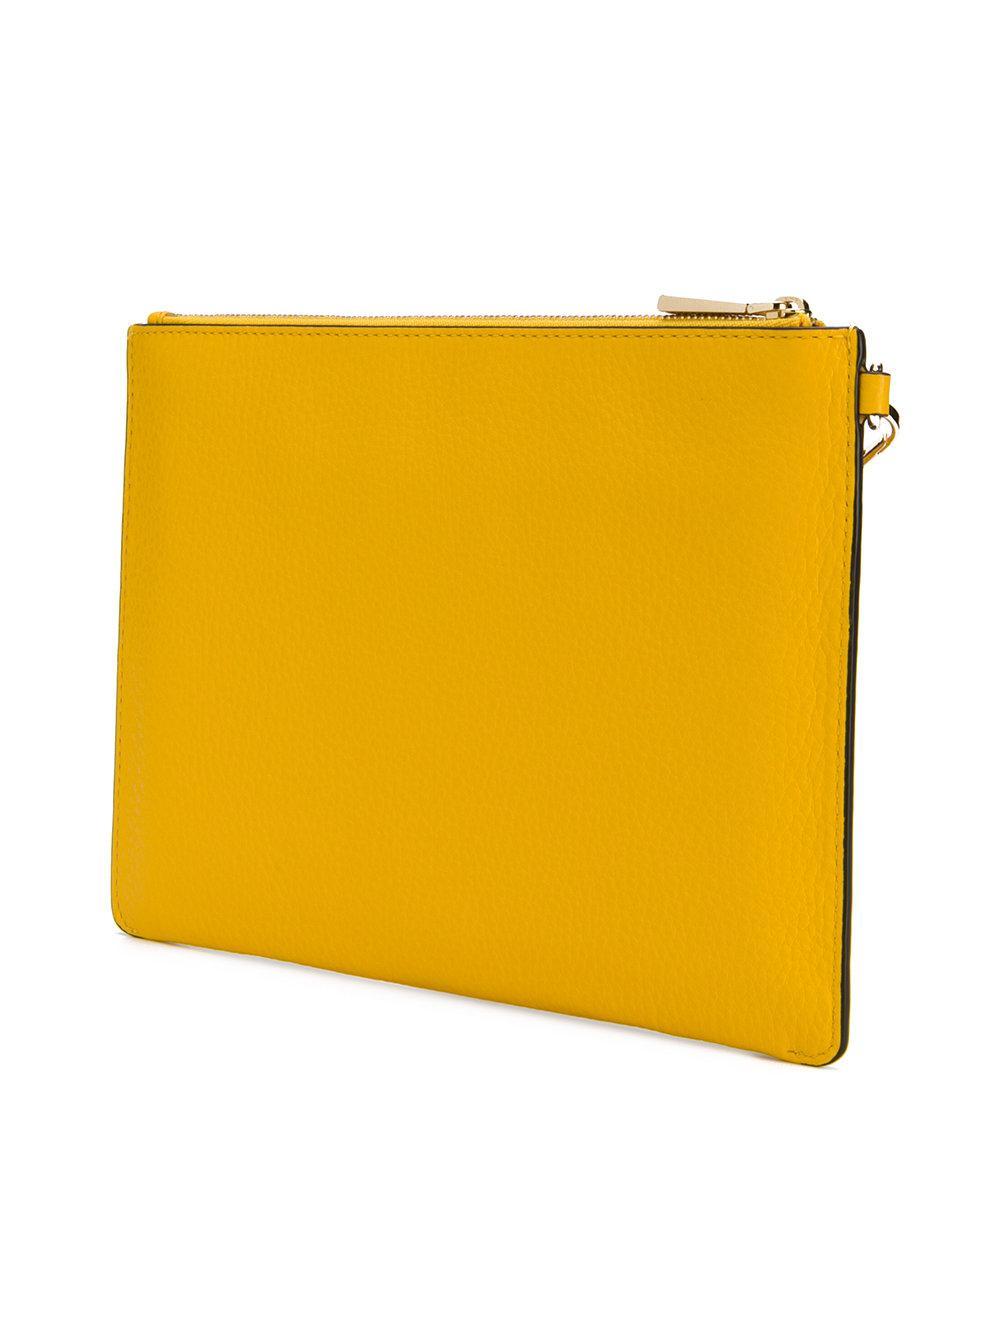 8e7713c551ebb3 MICHAEL Michael Kors - Yellow Floral Embellished Pouch - Lyst. View  fullscreen